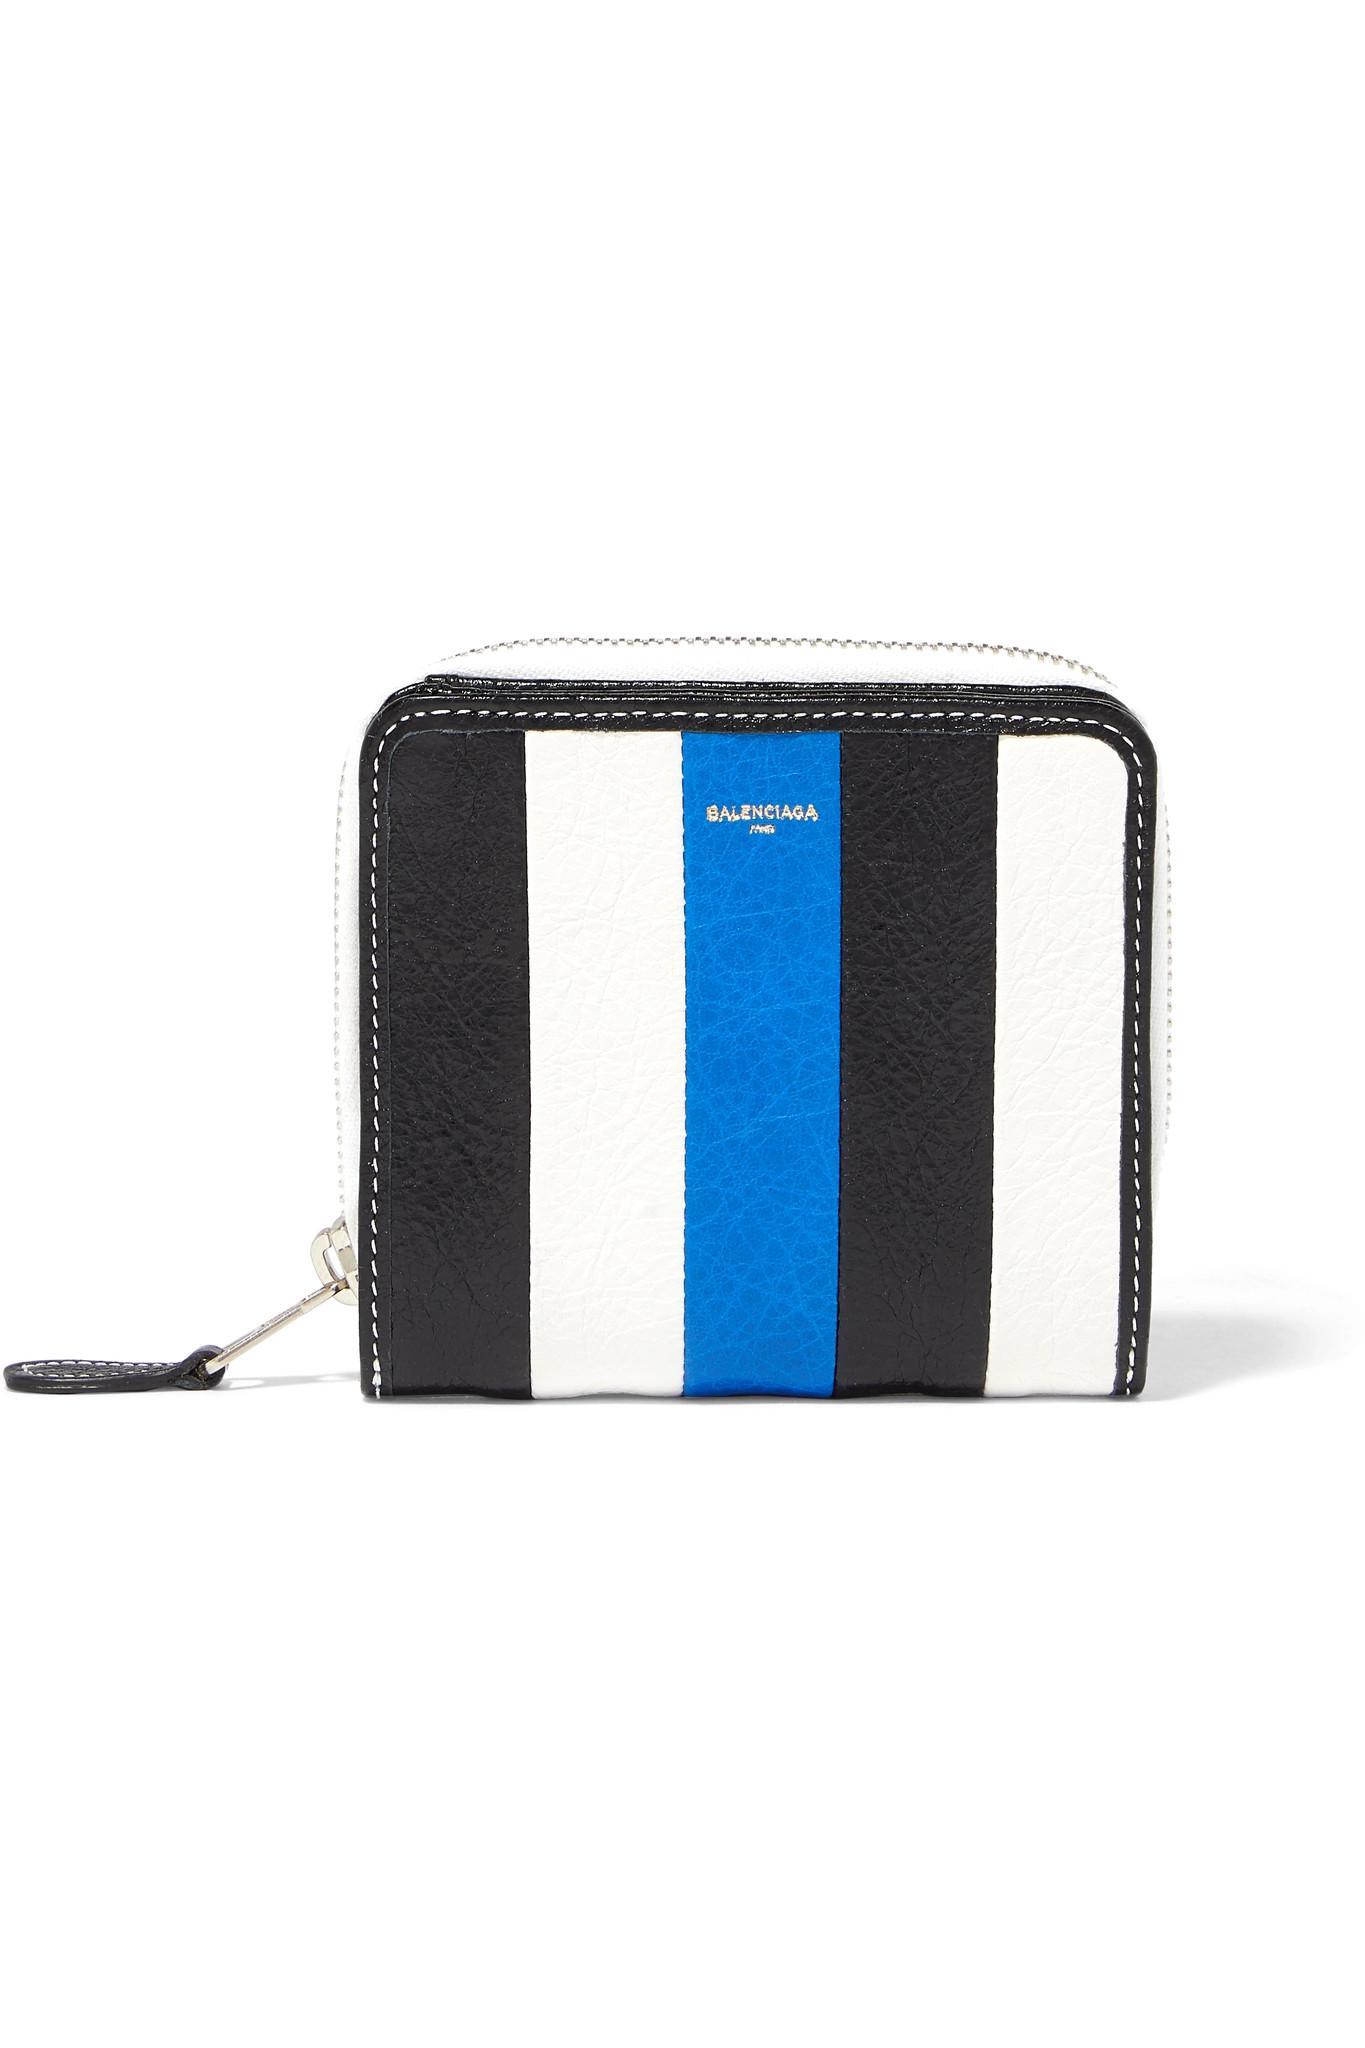 Bazar Striped Textured-leather Wallet - Blue Balenciaga kJD7ju